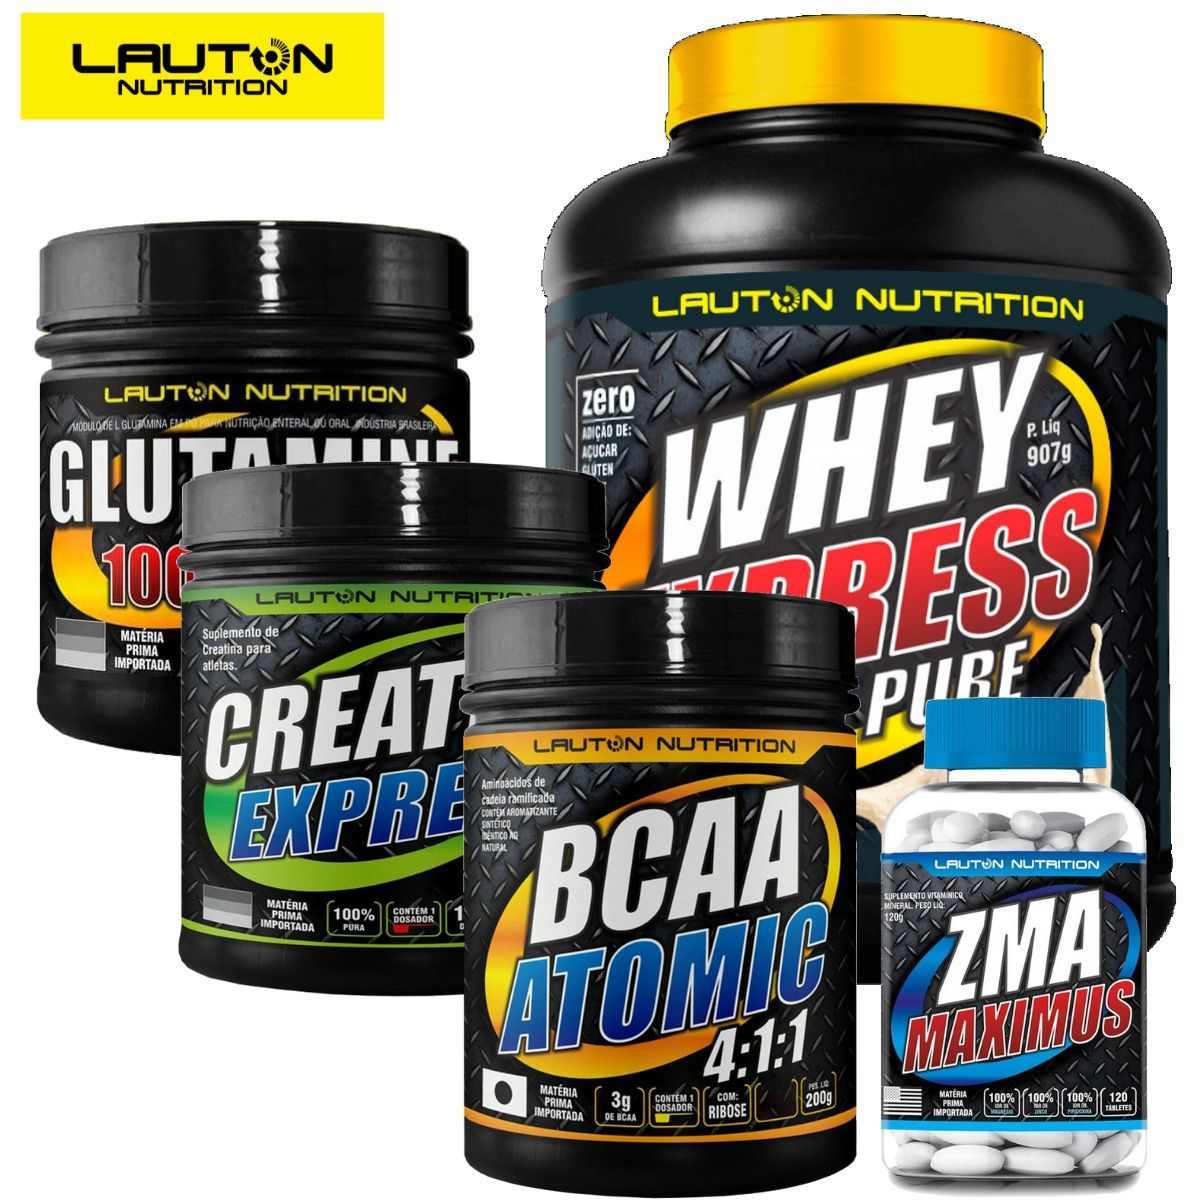 Kit 1 Whey Protein 907g + 1 Creatina 100g + 1 BCAA  200g + 1 ZMA 120 Tabs + 1 Glutamina 150g- Lauton Nutrition